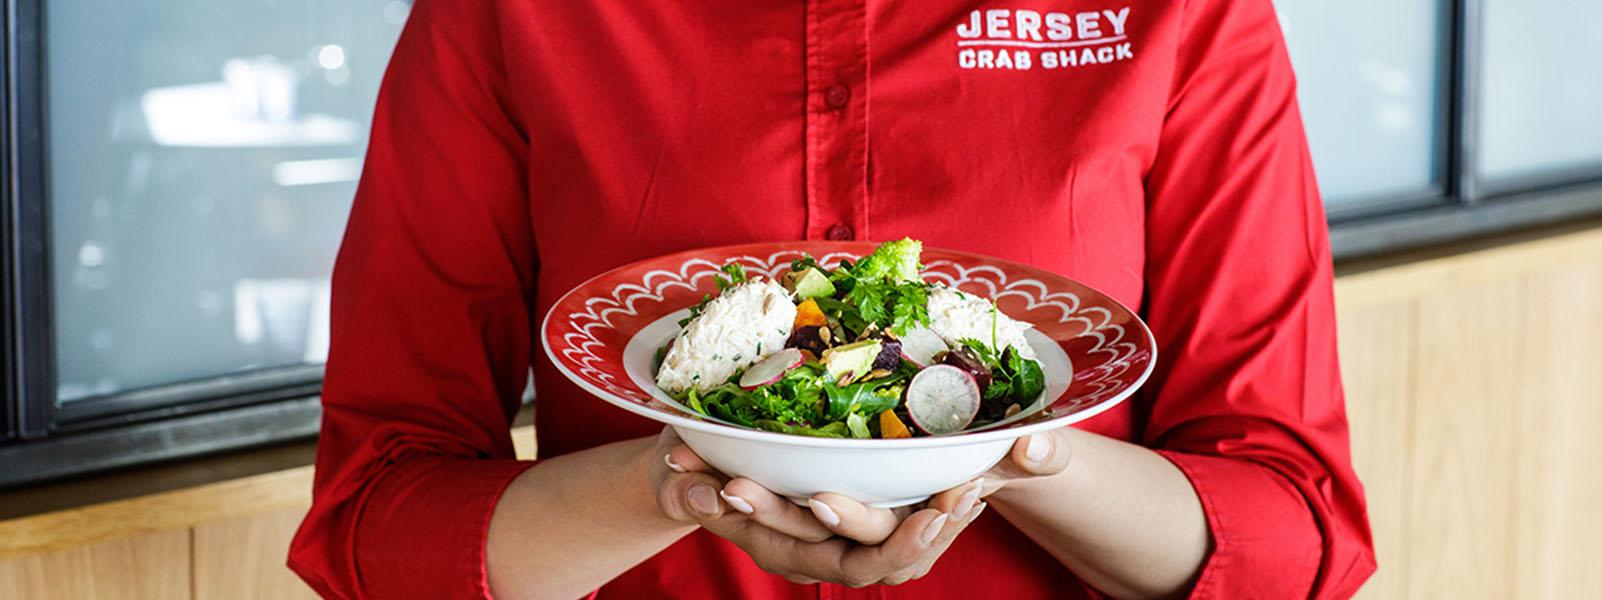 Jersey Crab Shack Salad Service